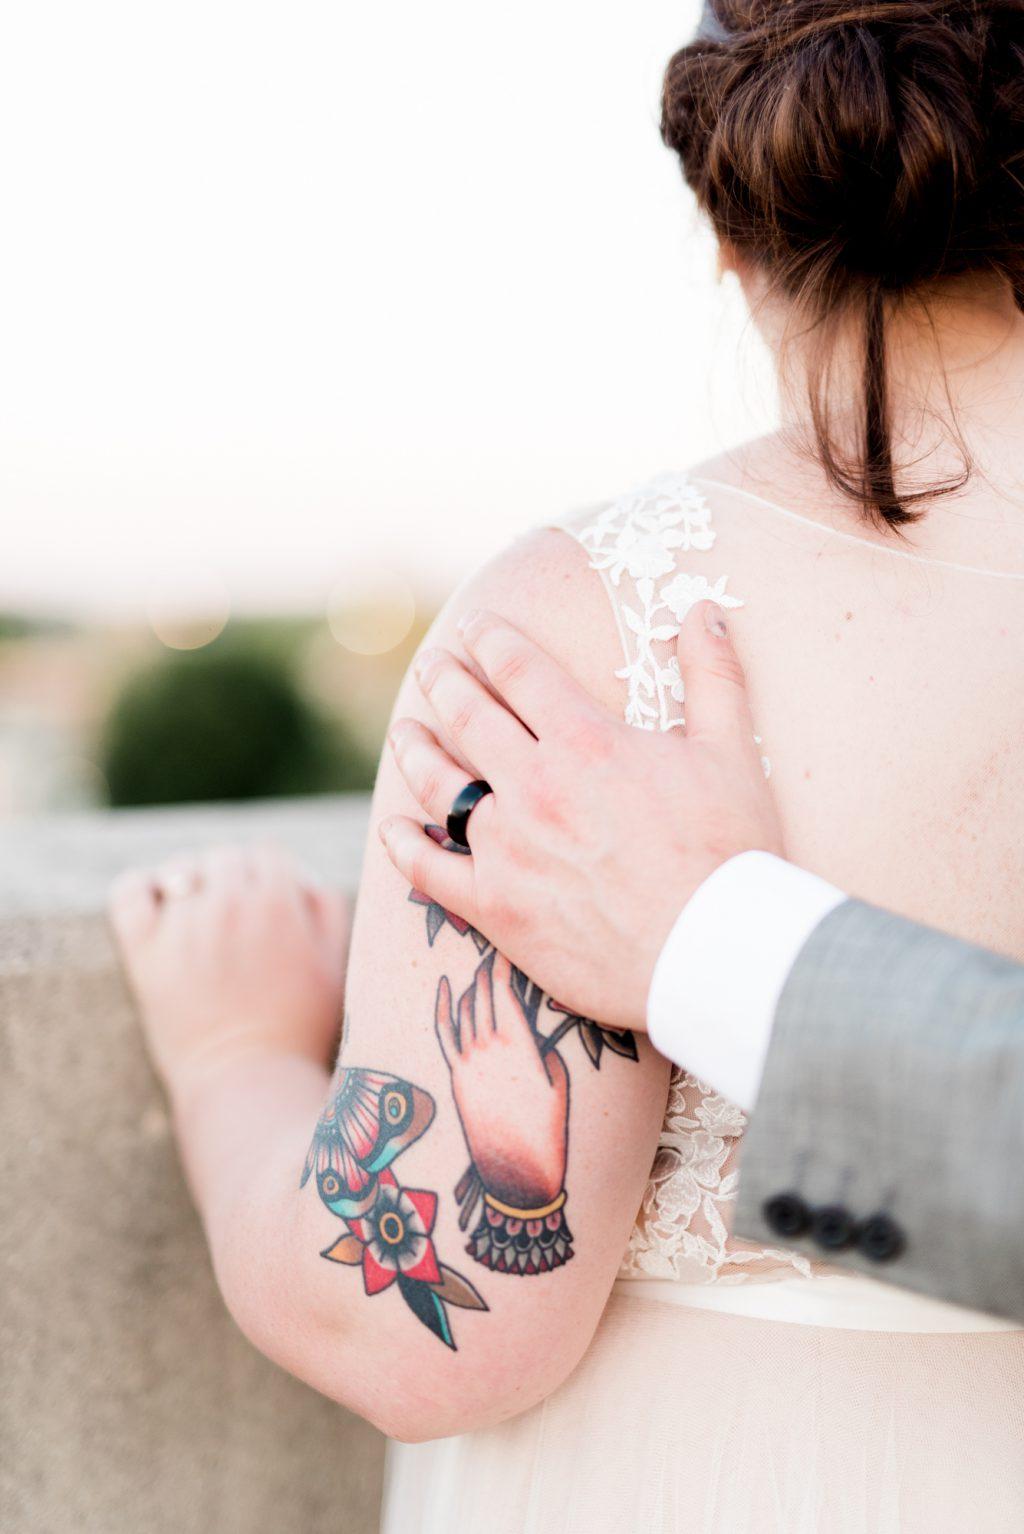 haley-richter-photo-west-chester-summer-wedding-boxcar-brewery-195